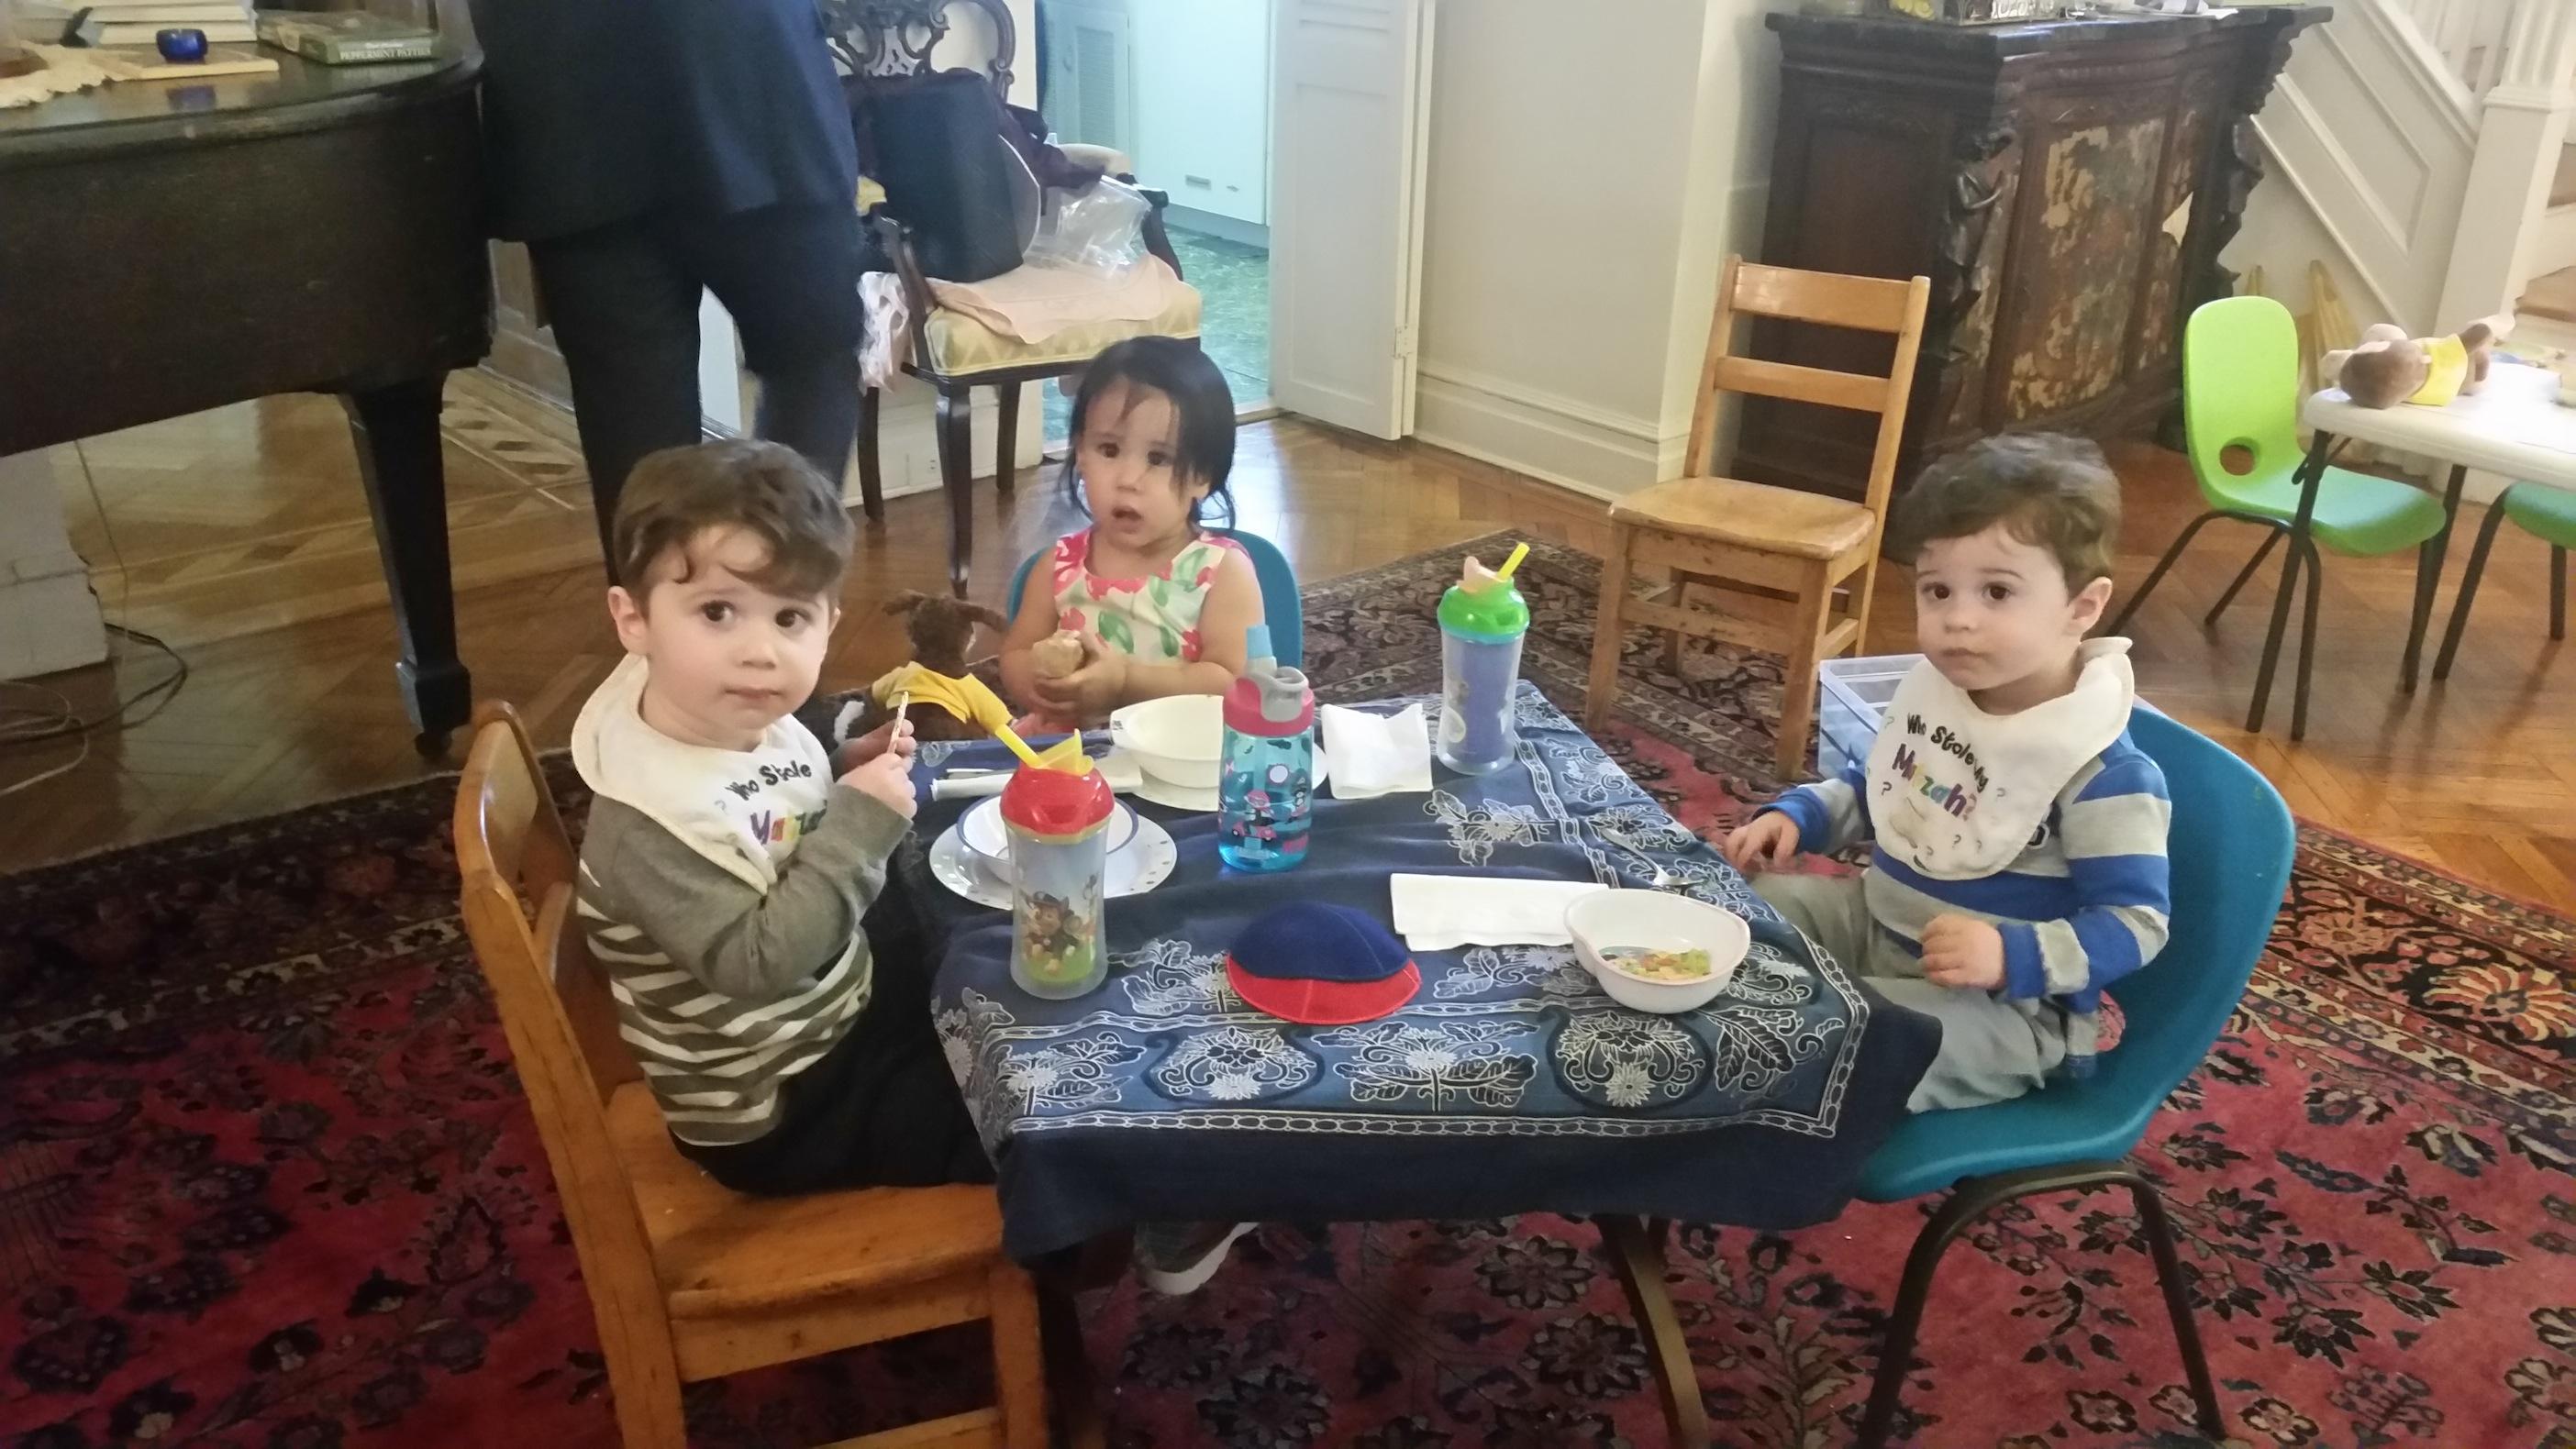 The Kids Table Interfaithfamily